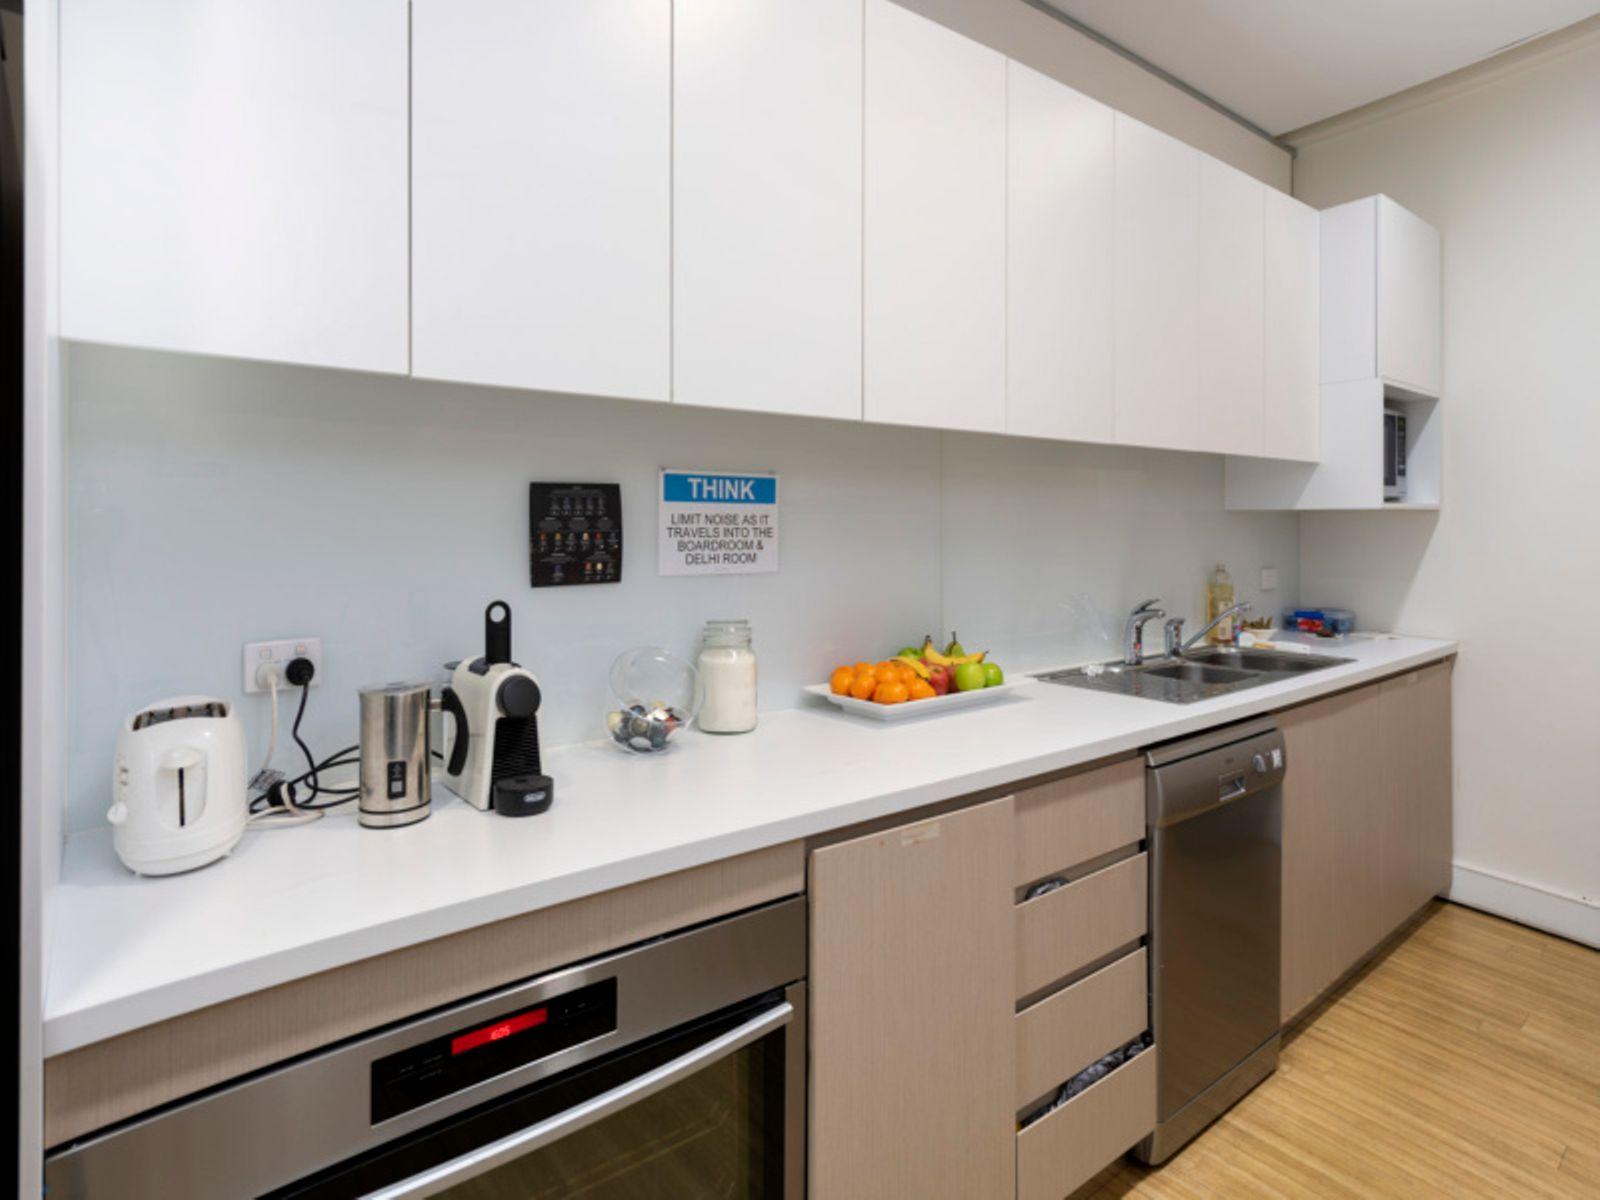 71 QR   Level 10 Kitchen DxO